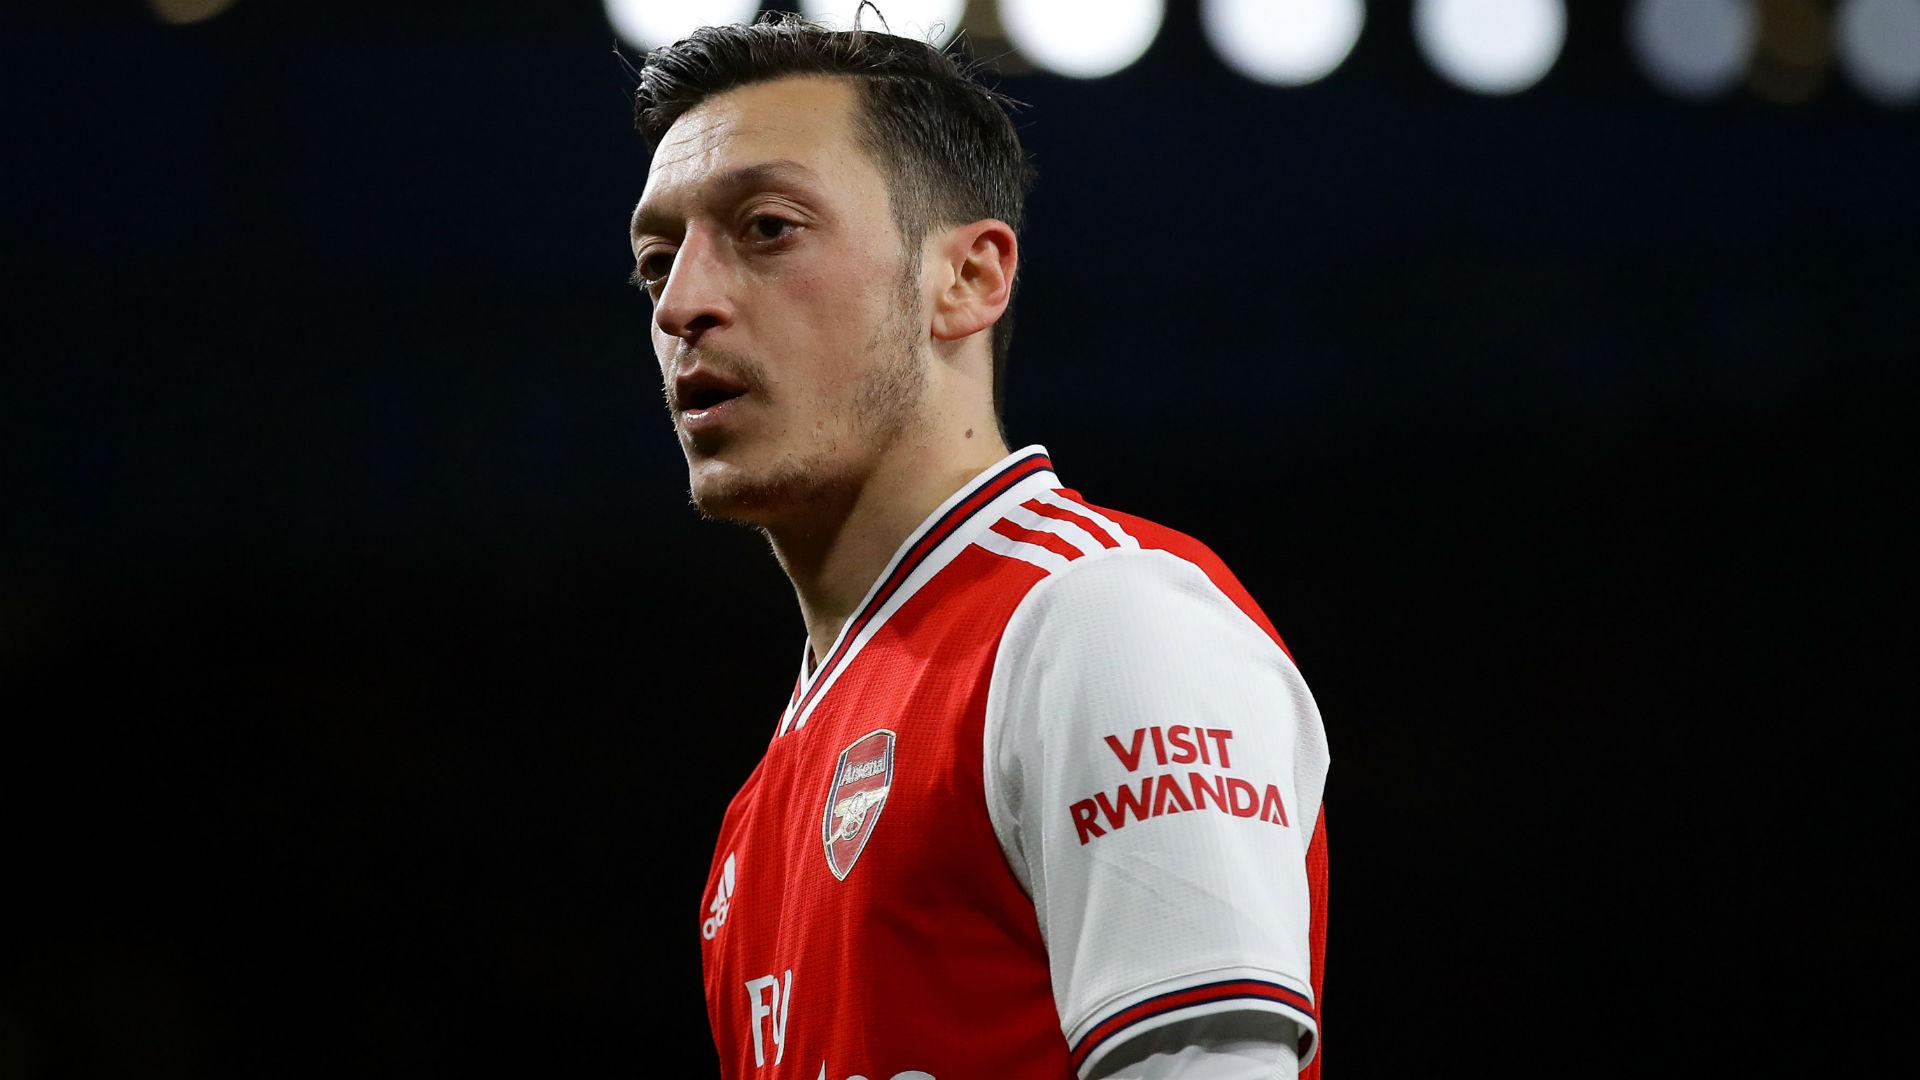 Arteta expects Ozil decision in 'next few days' as midfielder nears Arsenal exit